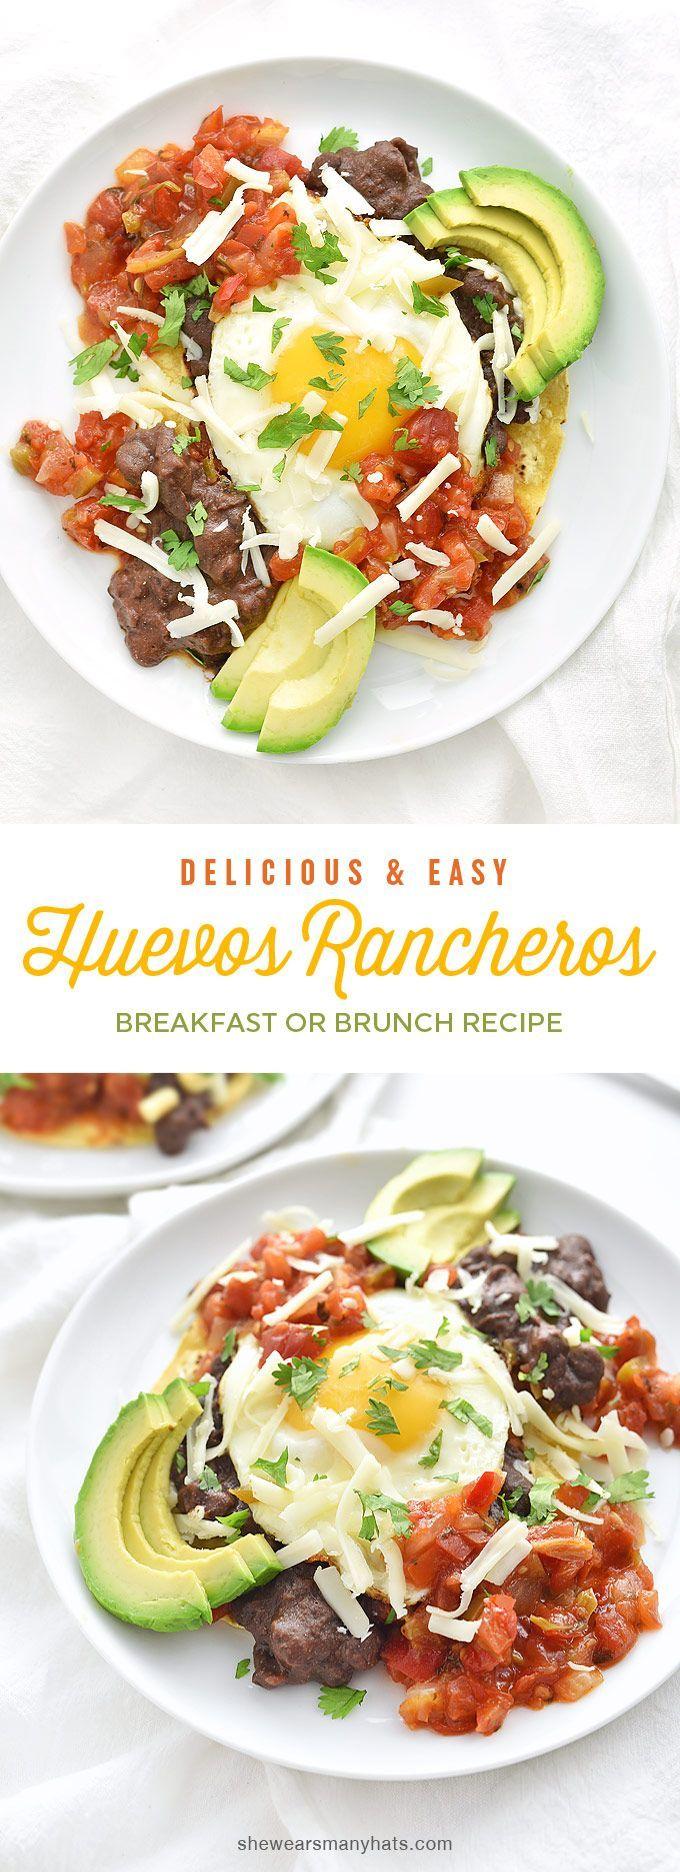 Easy Huevos Rancheros Recipe | shewearsmanyhats.com #BushsBeans @Bushsbeans #spon